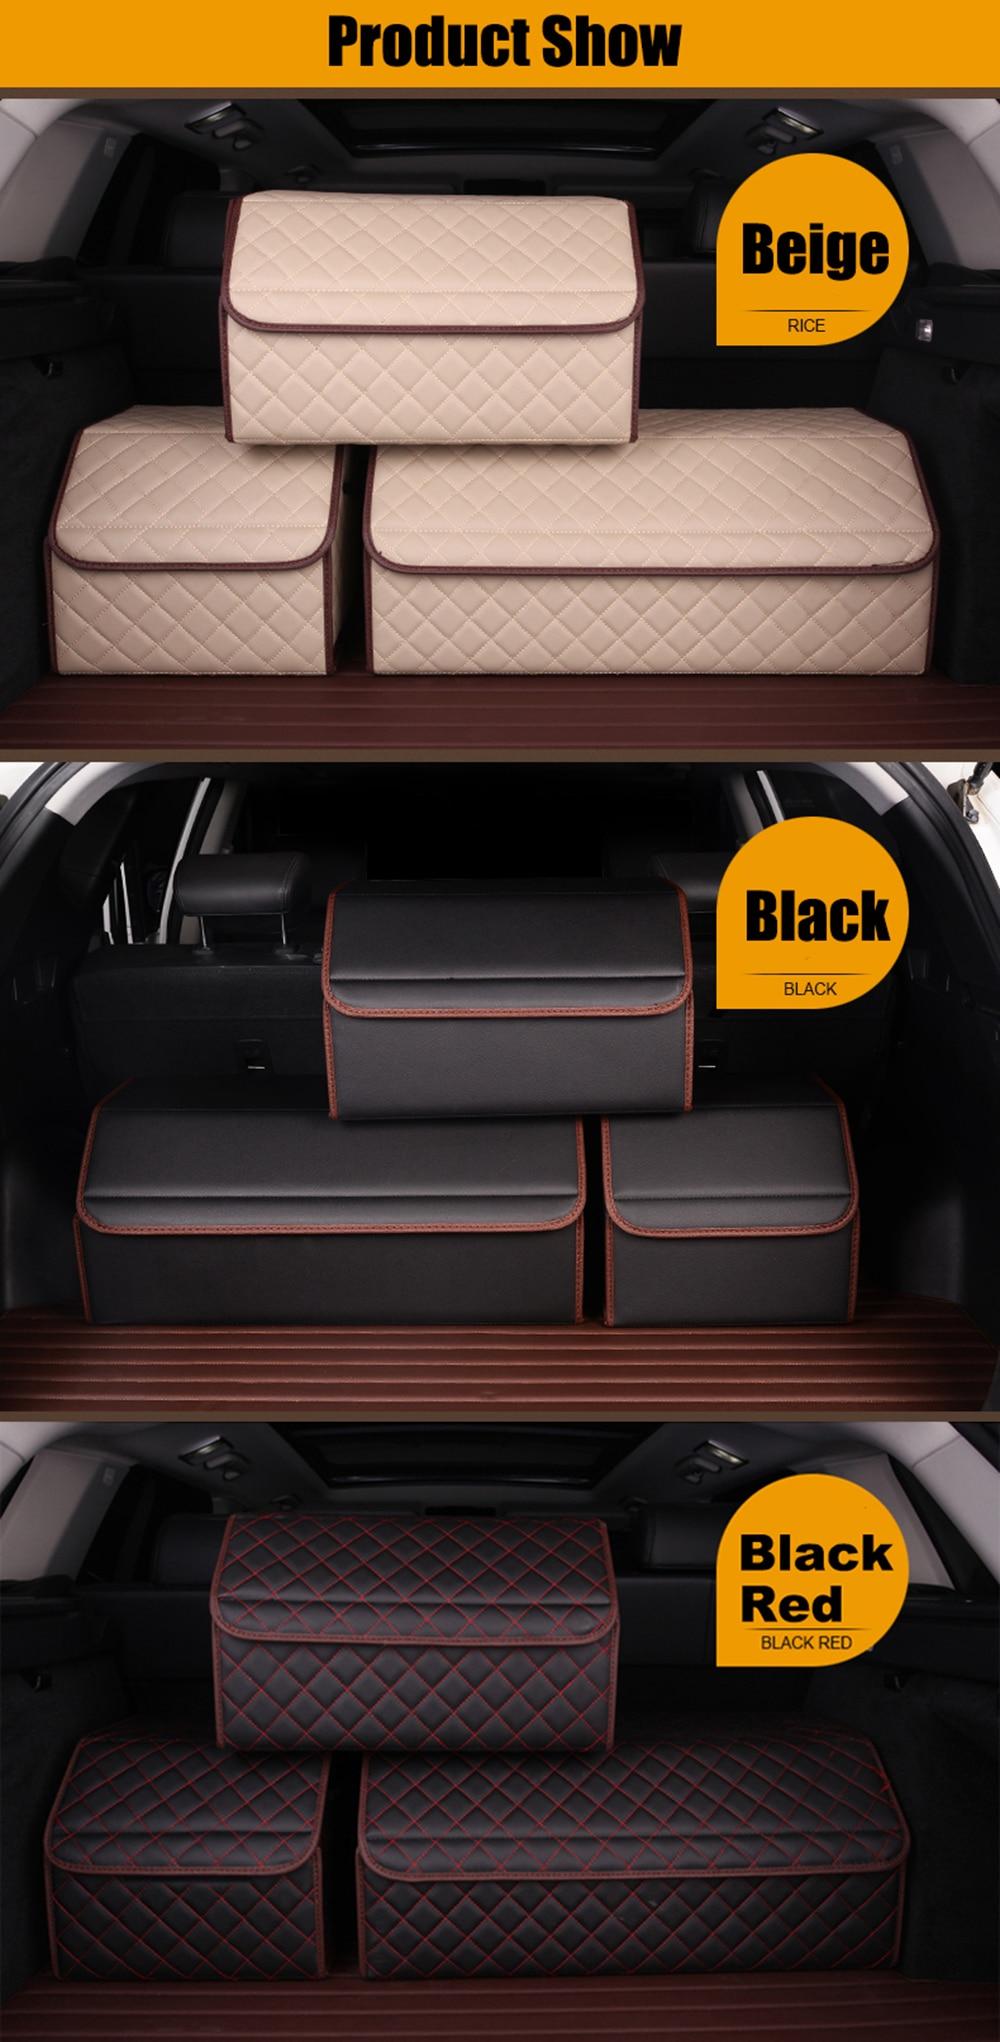 Big Organizer Box for Cars